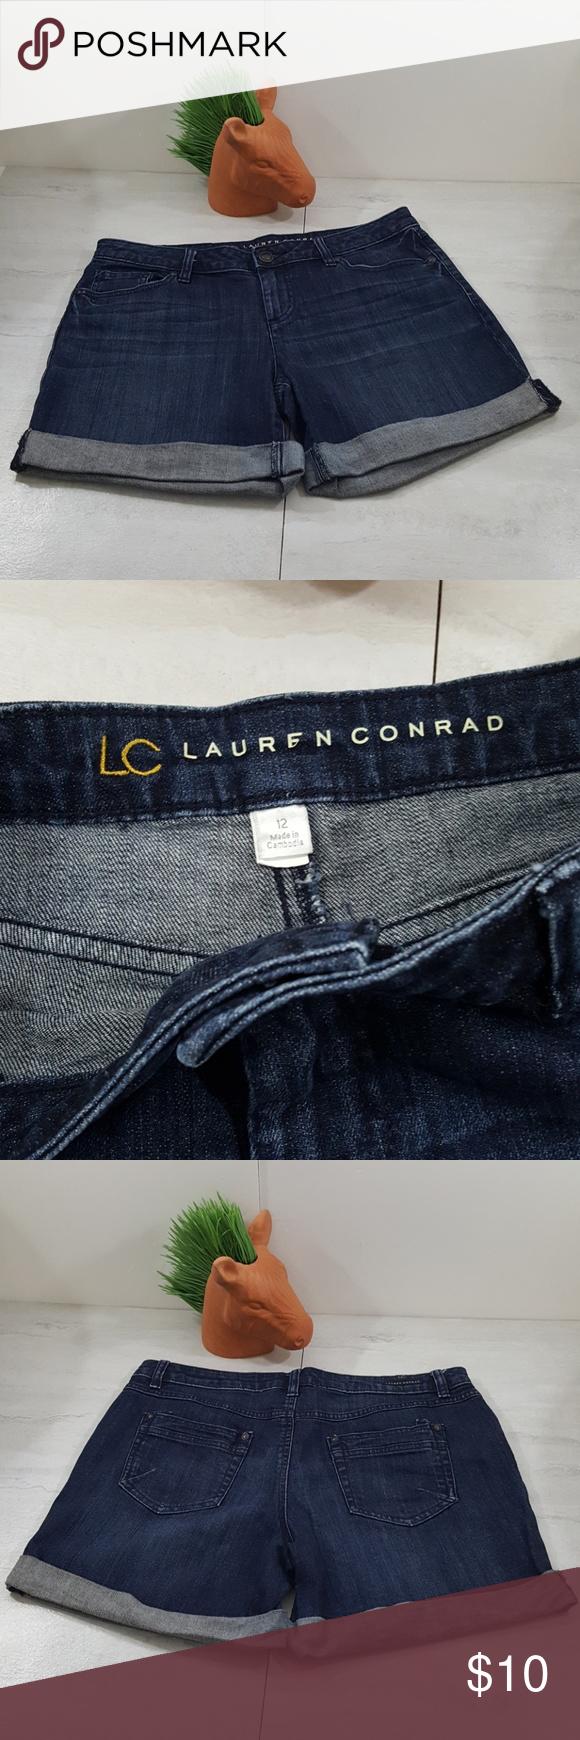 LC Lauren Conrad Shorts Lauren Conrad Jean Shorts! These